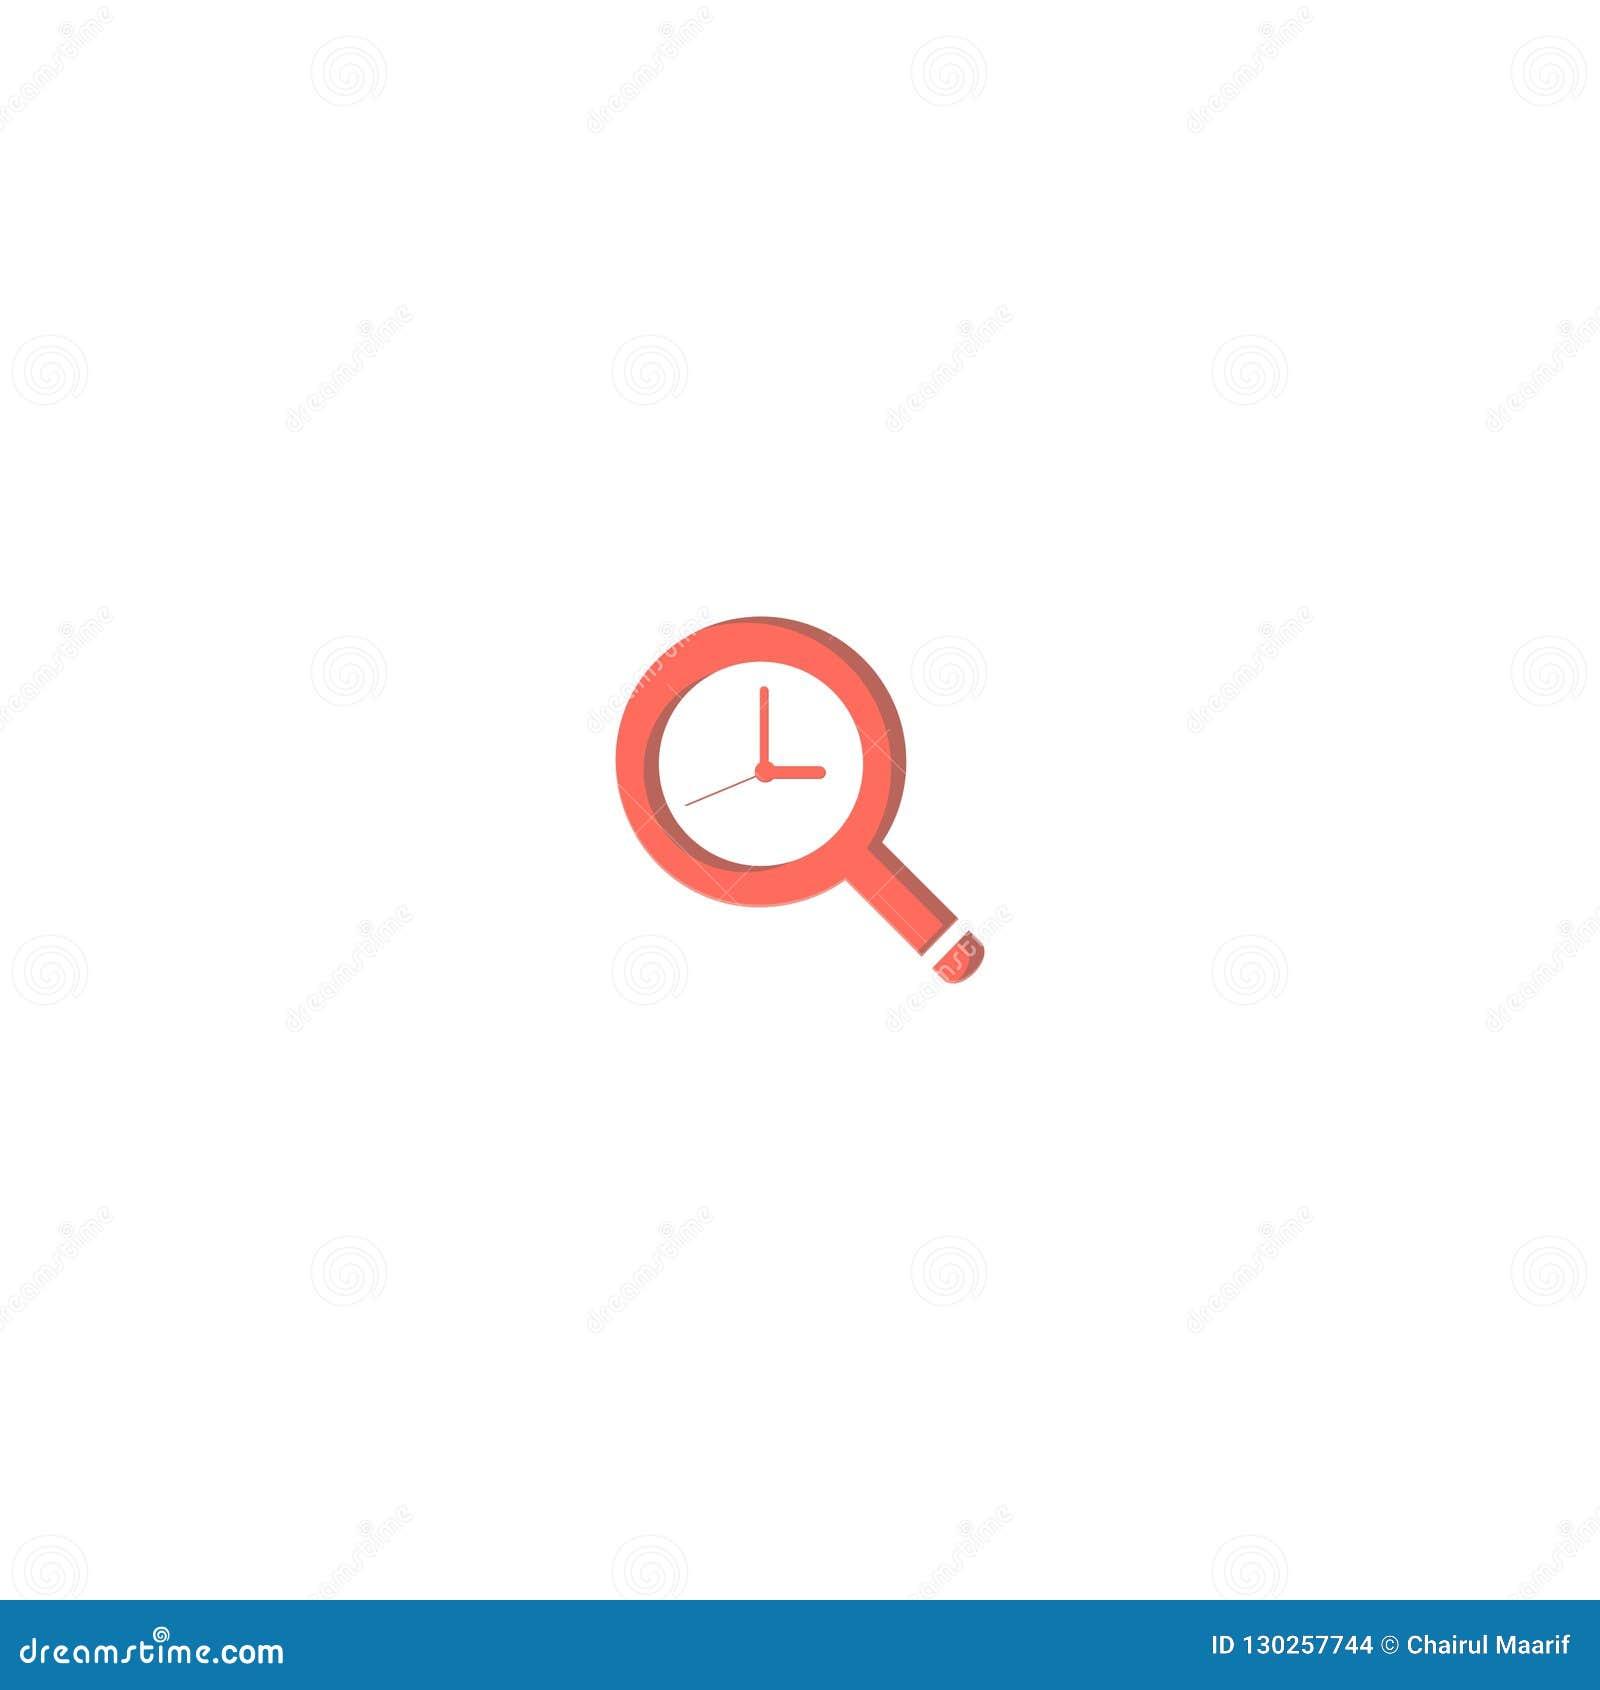 Magnifying glass and Clock logo design. symbol dan icon vector template